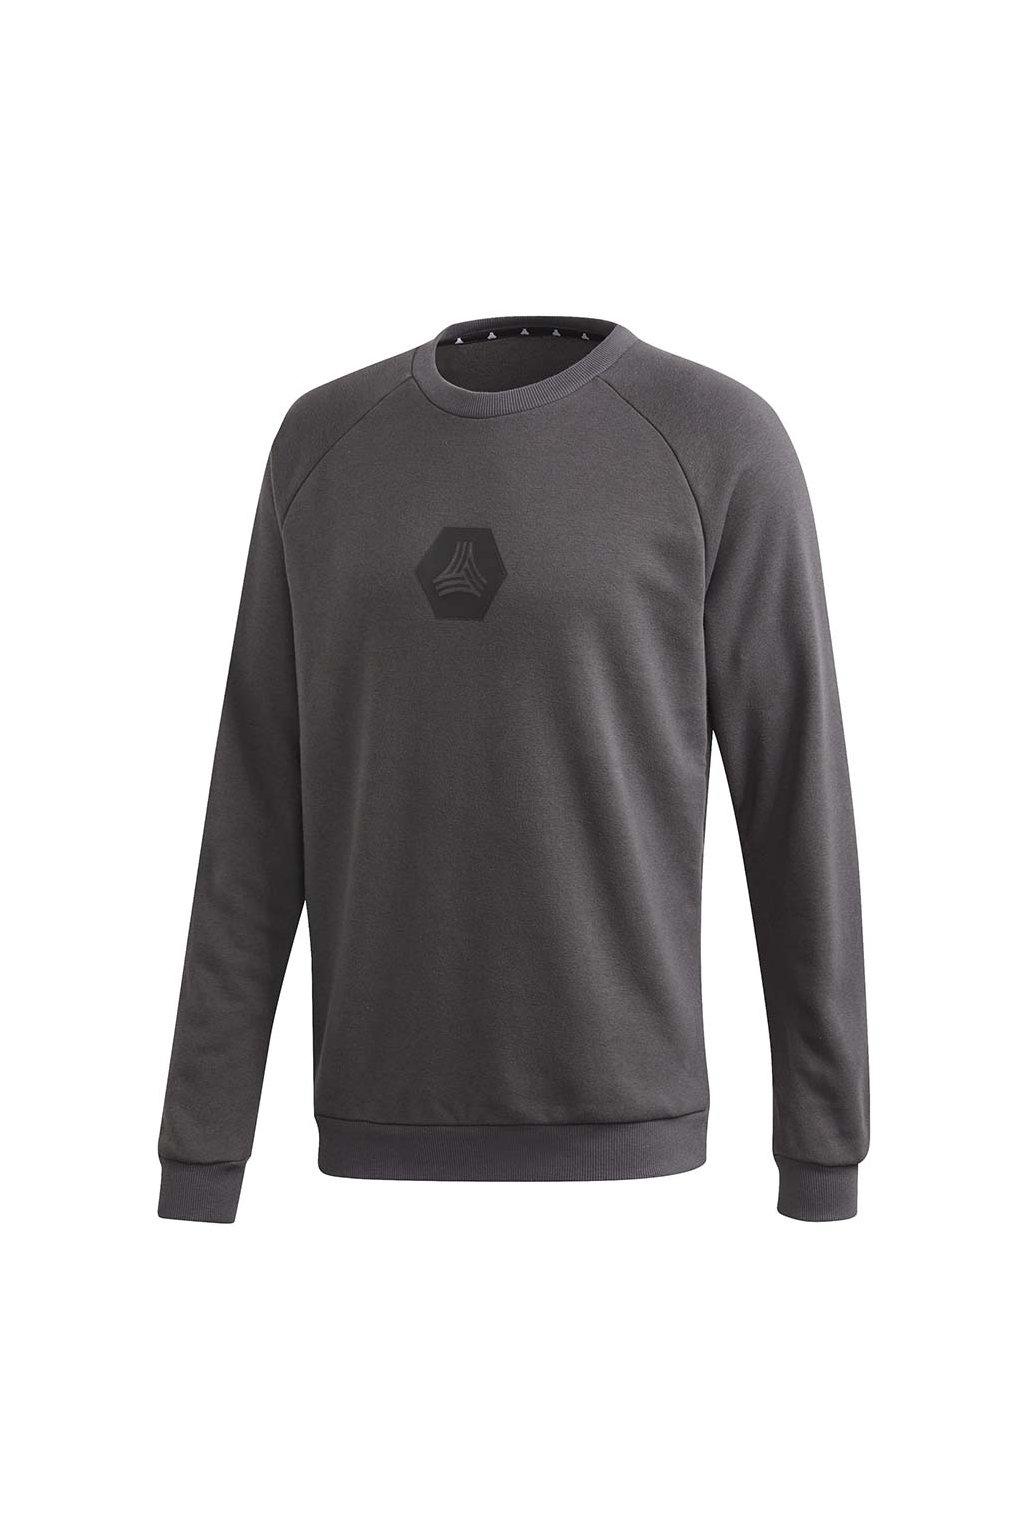 Tričko Adidas Tan Crew Sweat Logo šedé FM0861